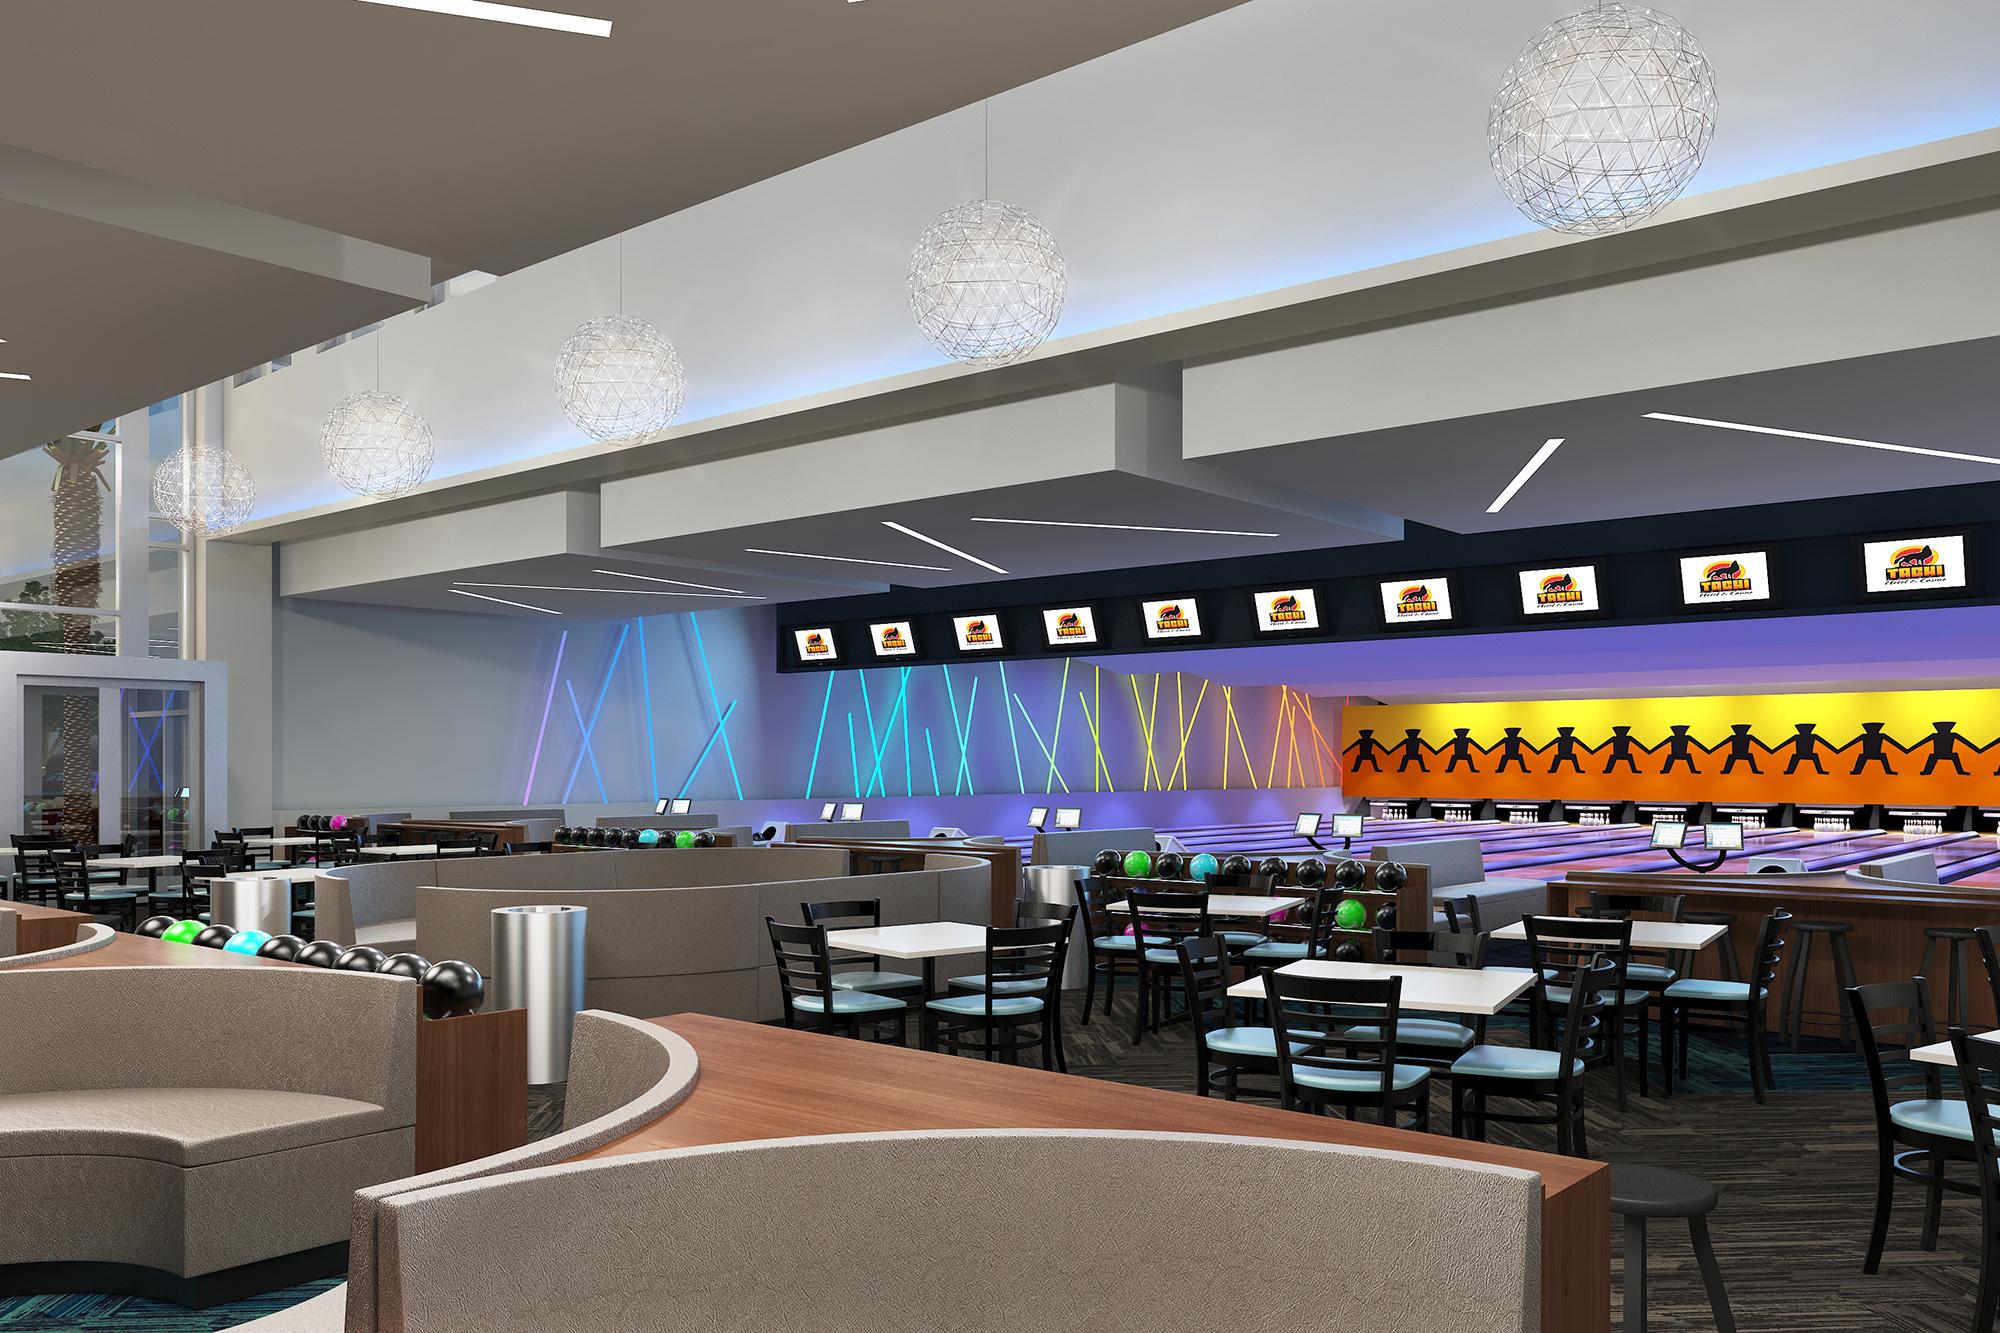 Tachi Palace Family Entertainment Center Ffkr Architects